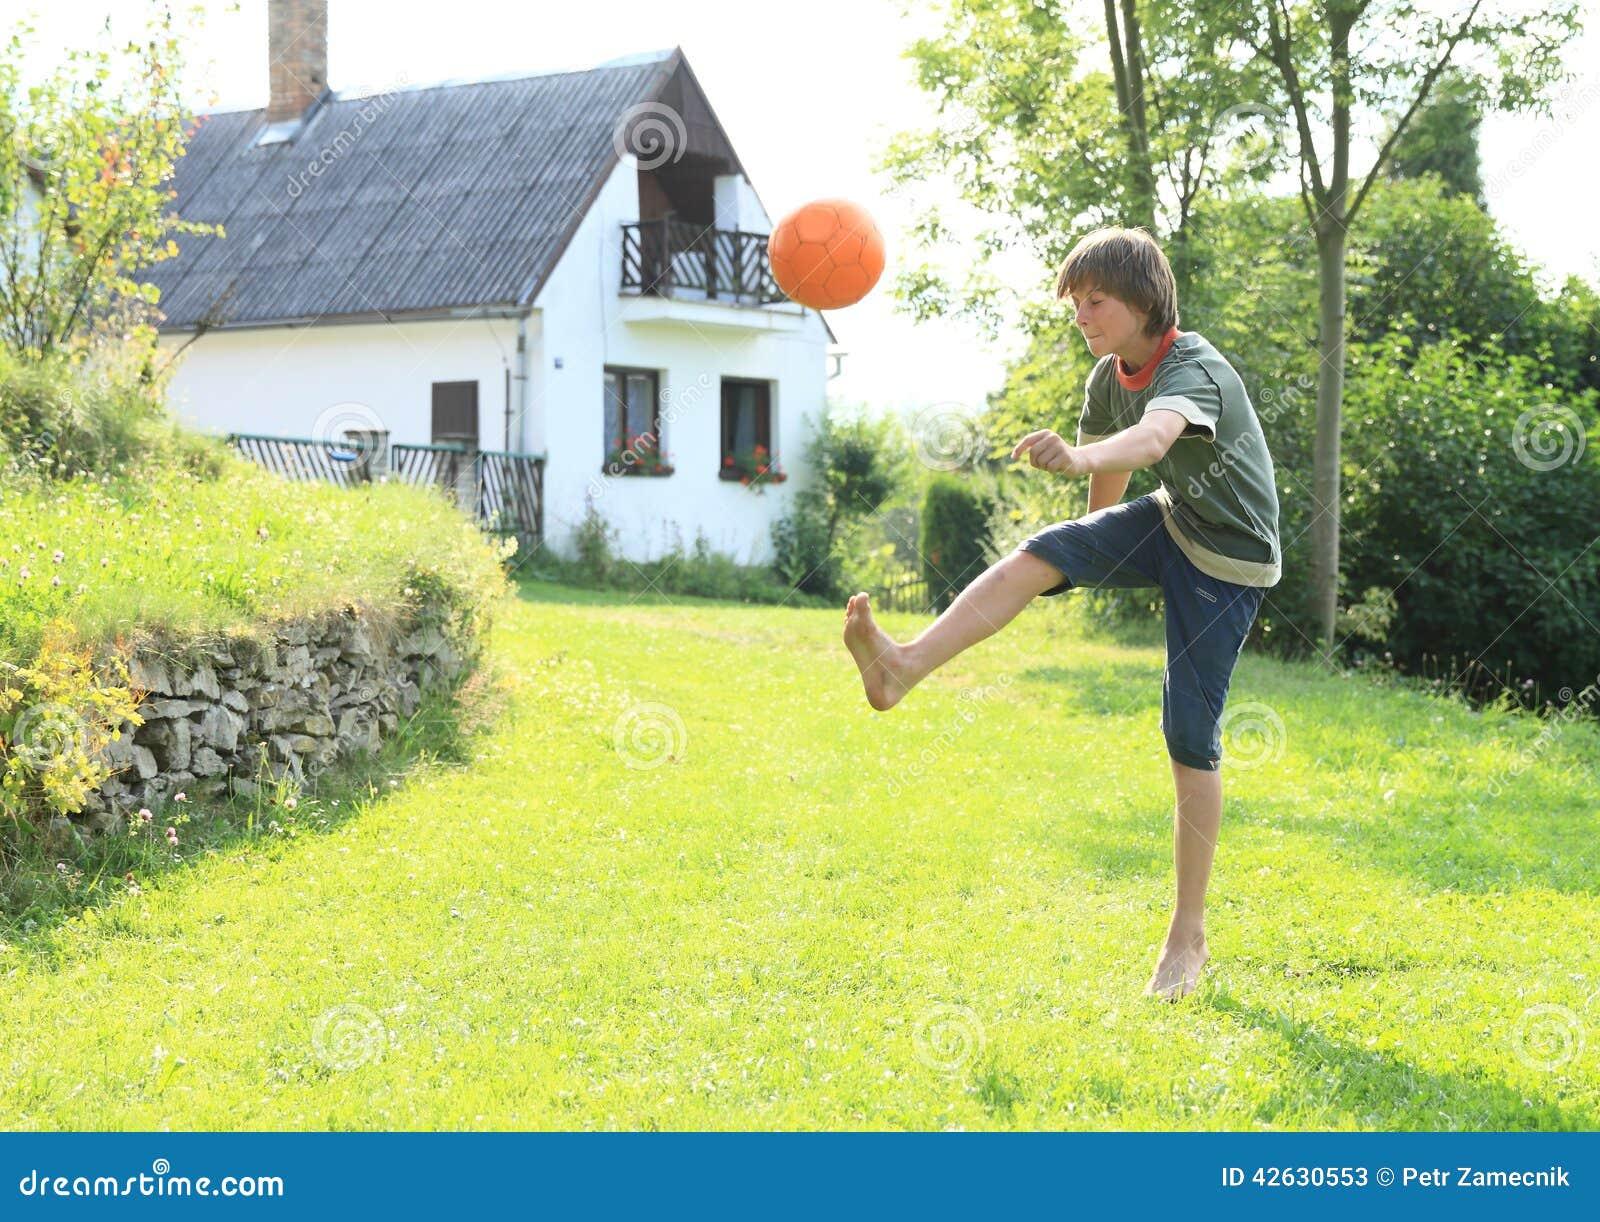 football stock photo image 42630553